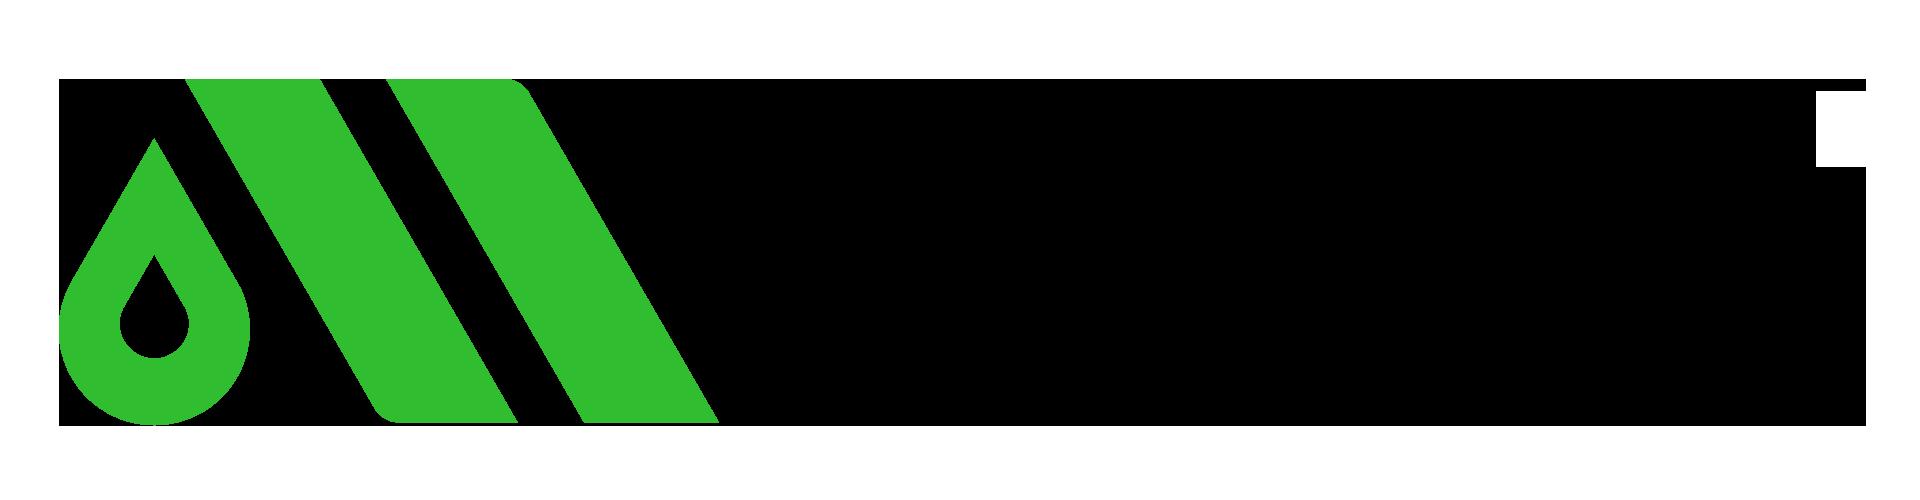 Milbur-plumbing-logo